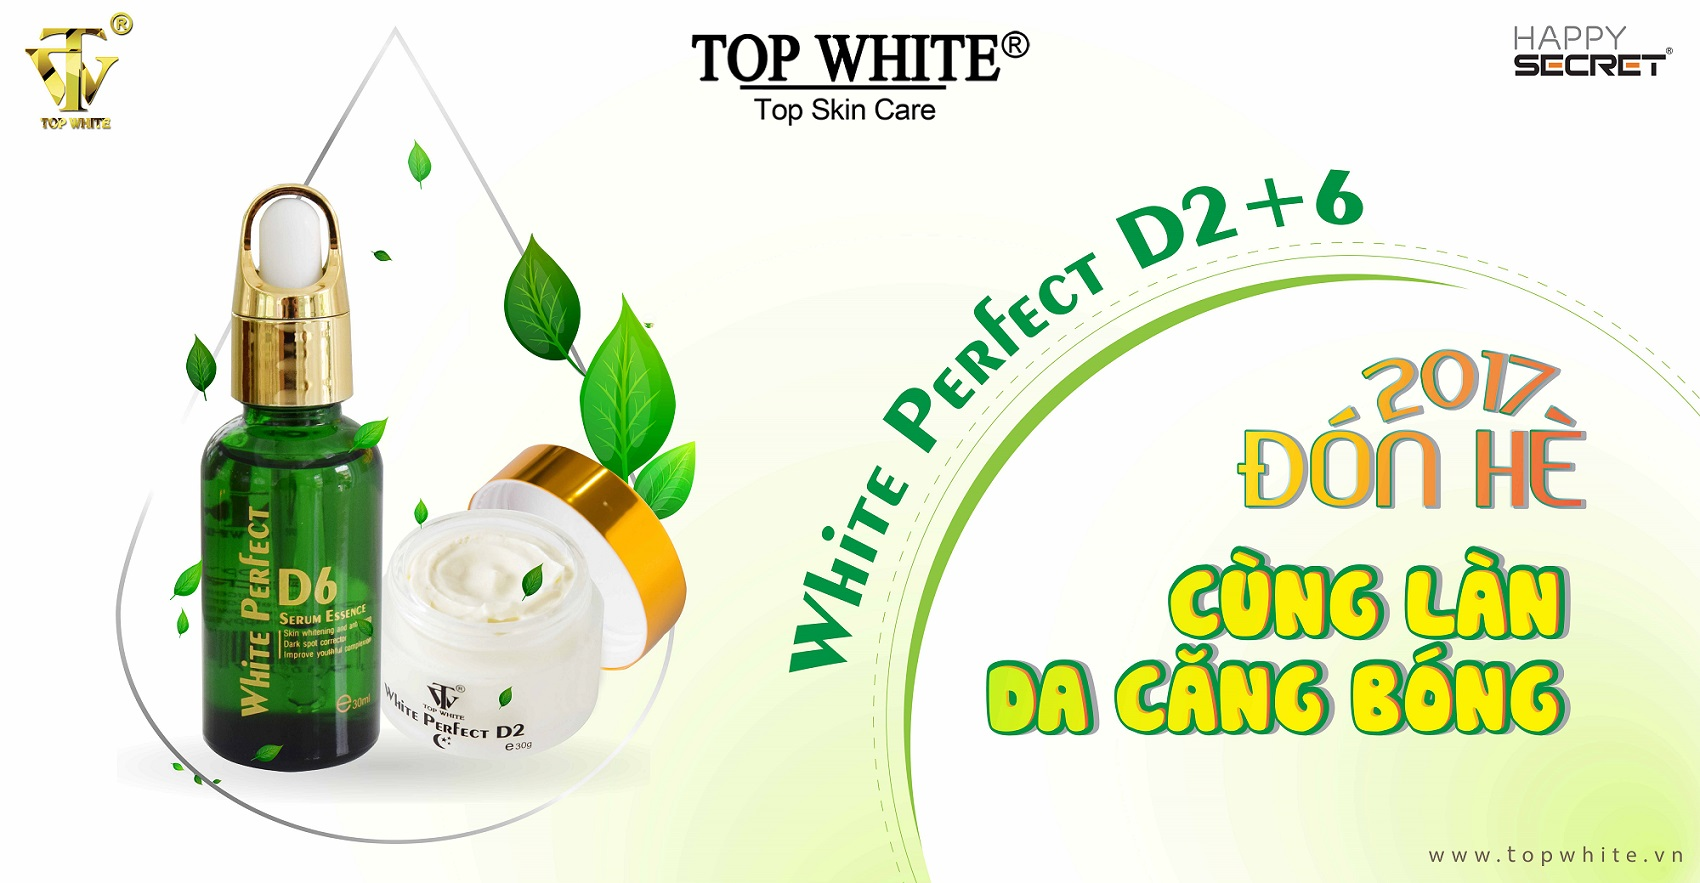 kem top white d2 kem dưỡng ban đêm